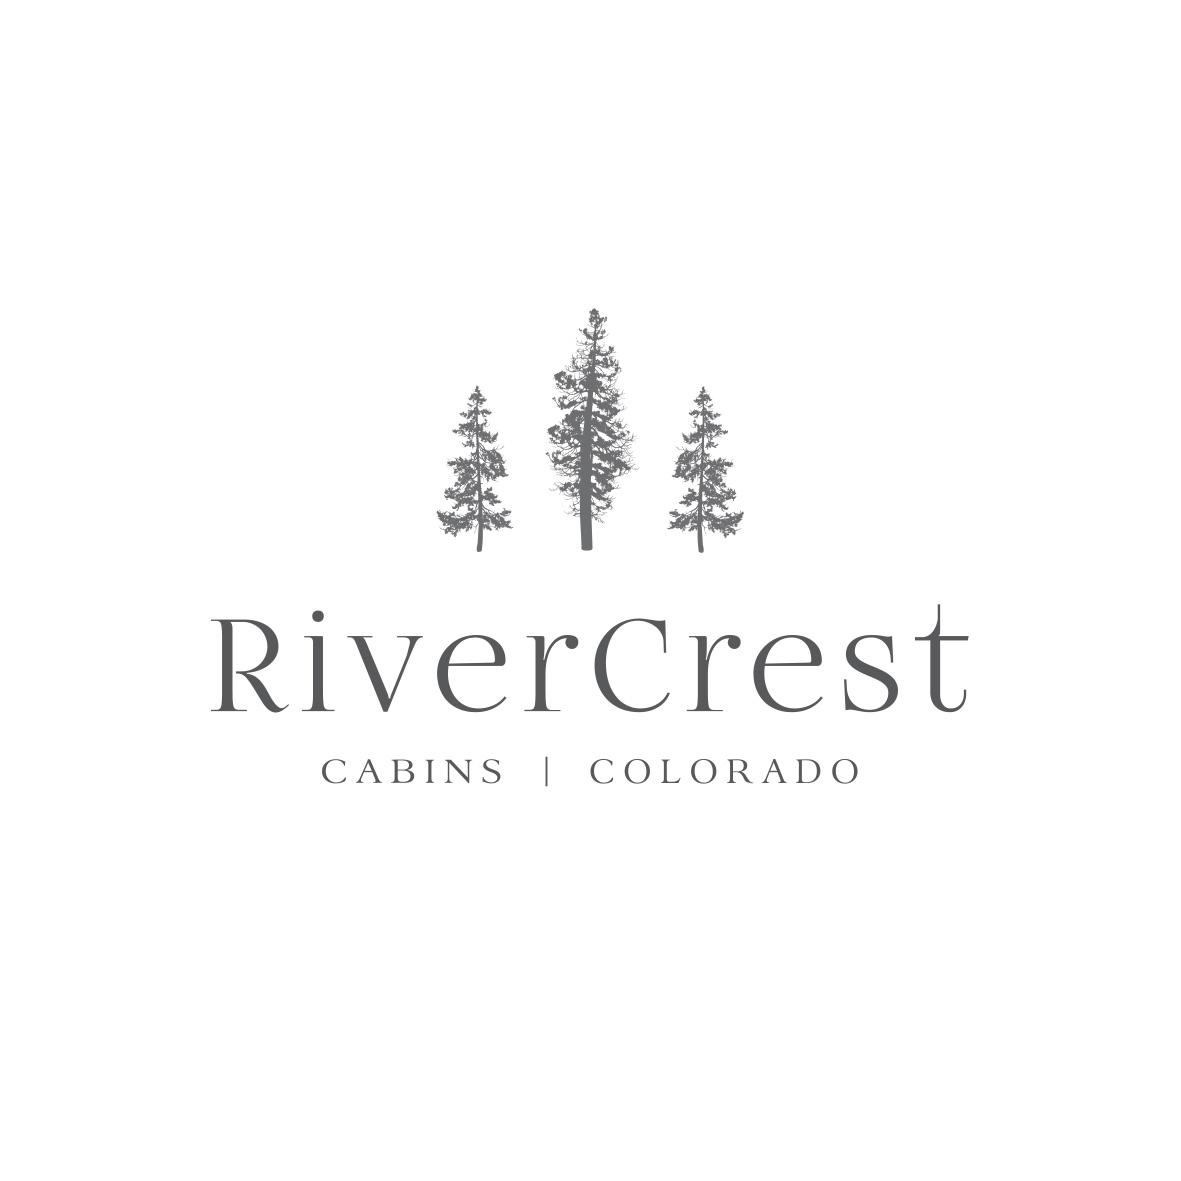 RiverCrest Colorado Logo Design by Billie Hardy Creative